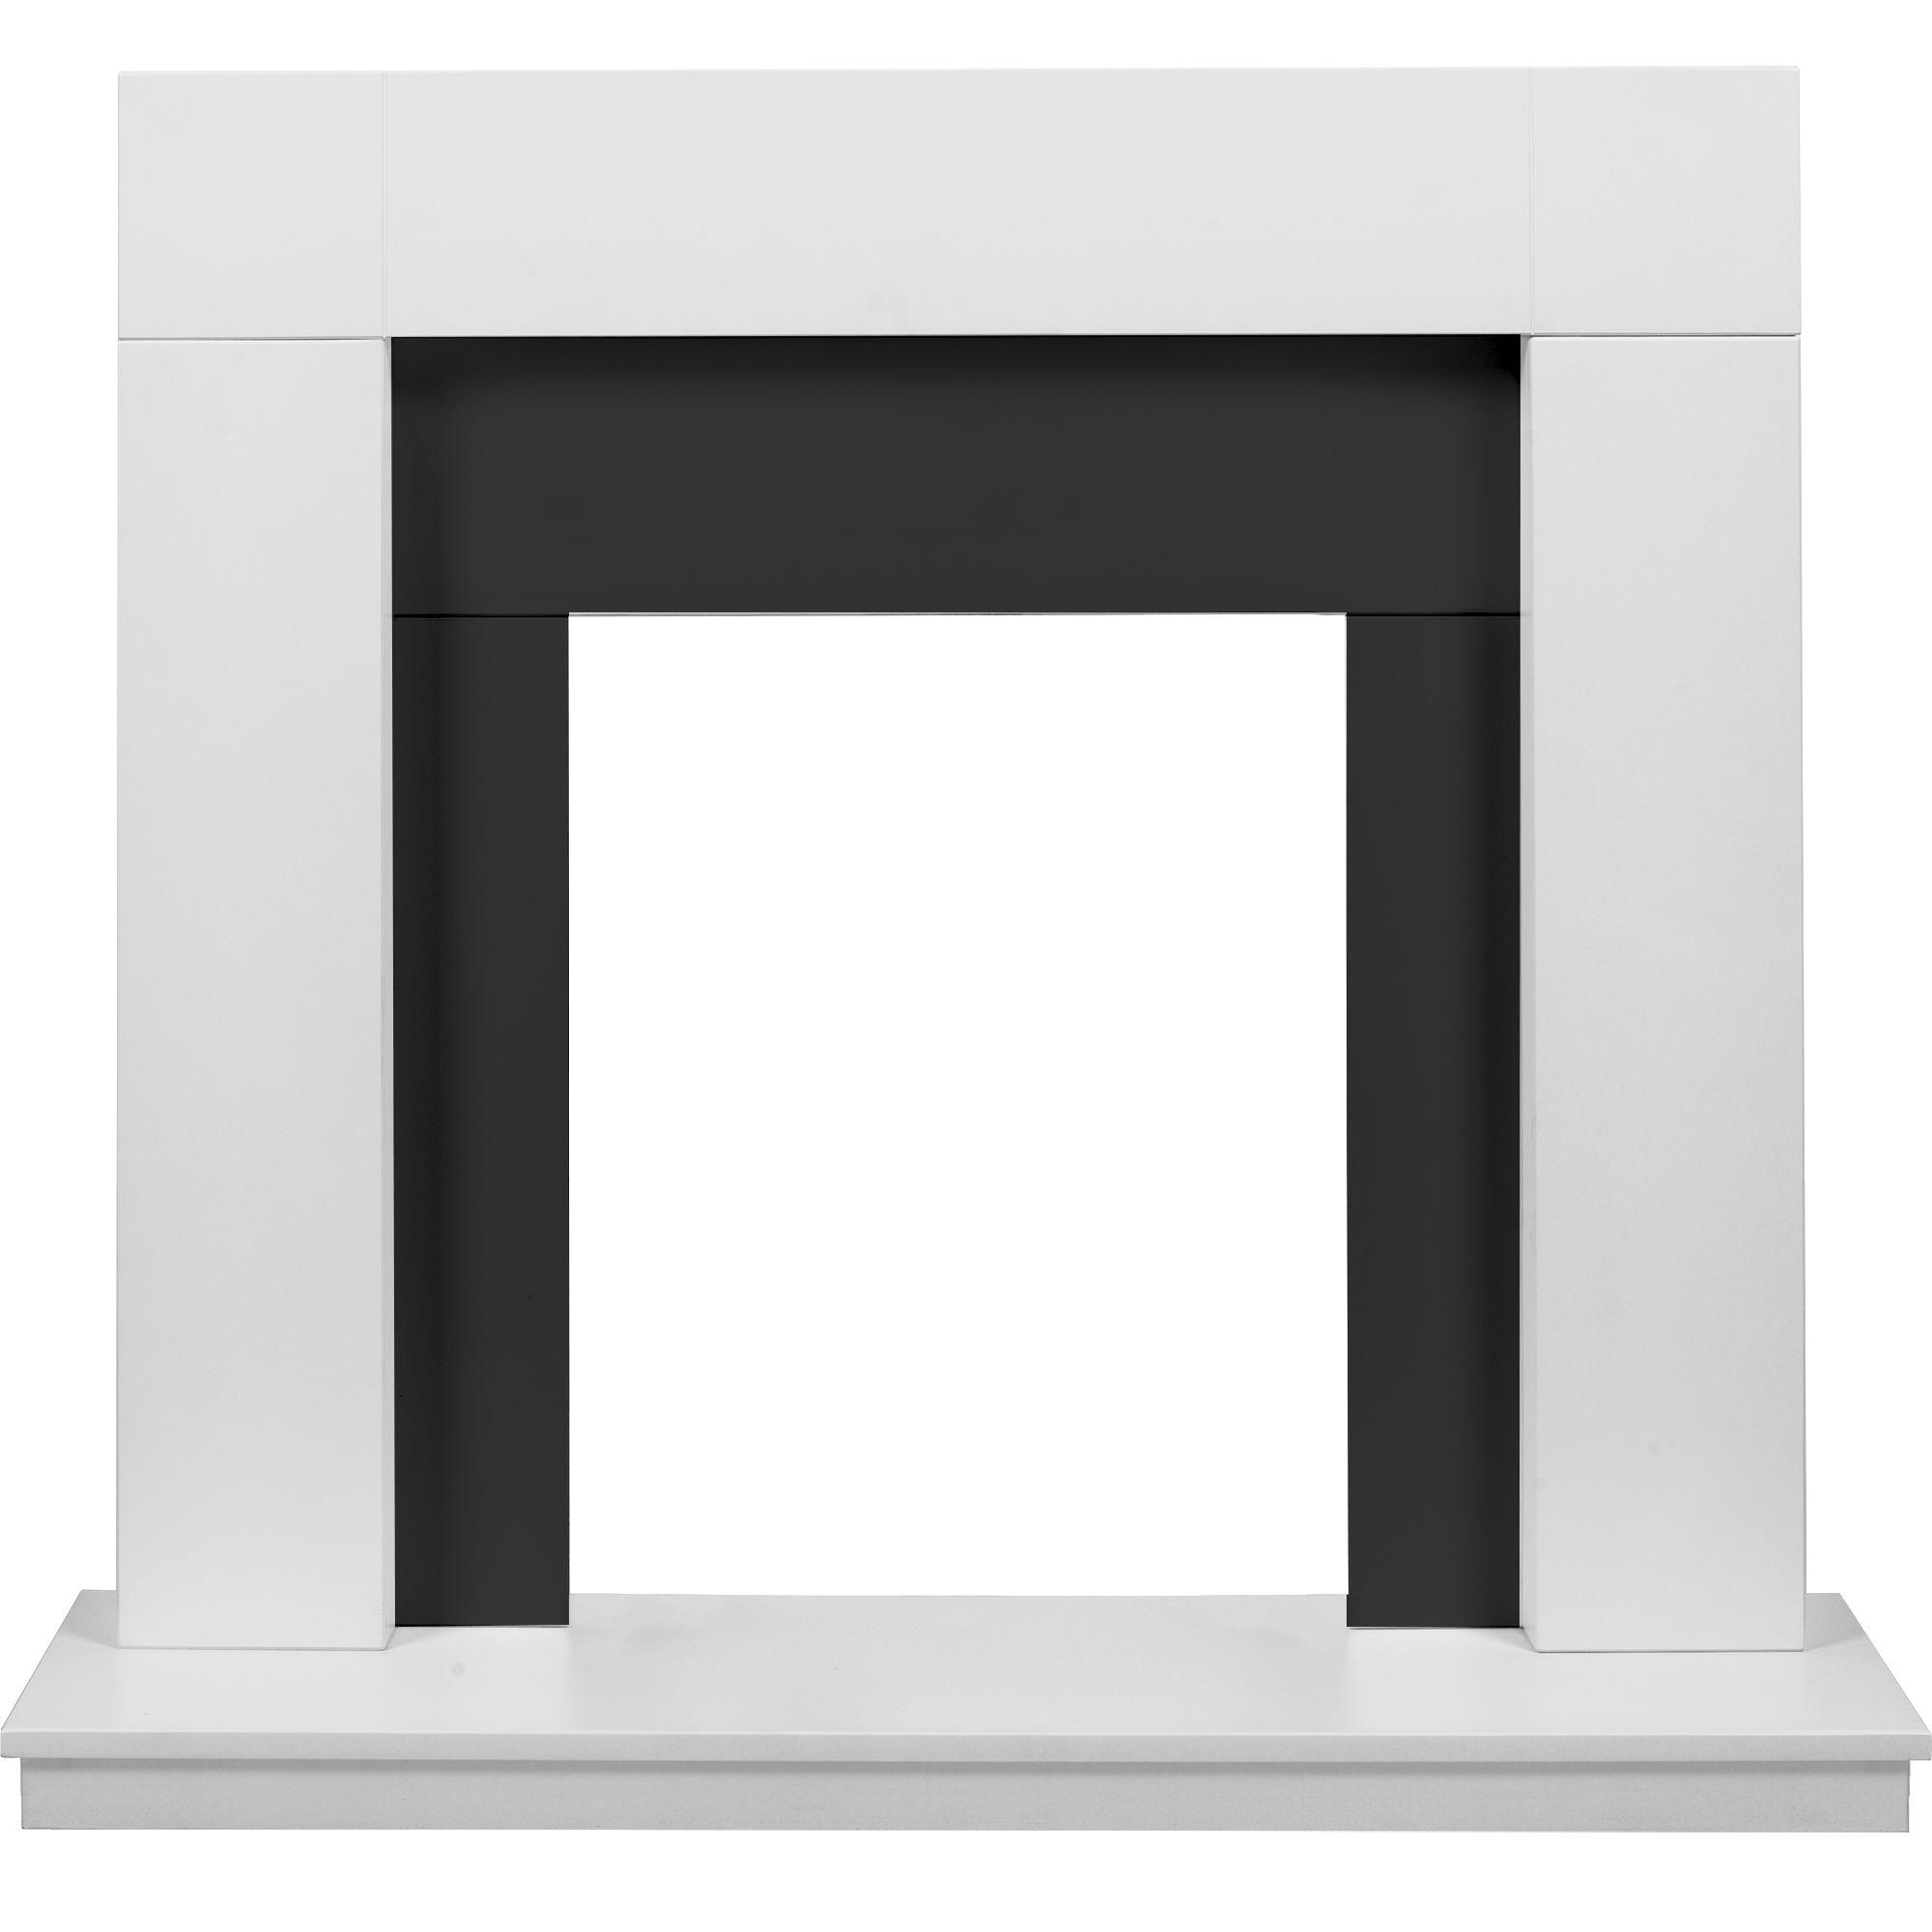 santa rosa black u0026 white mdf fire surround set h 925 w 1000mm